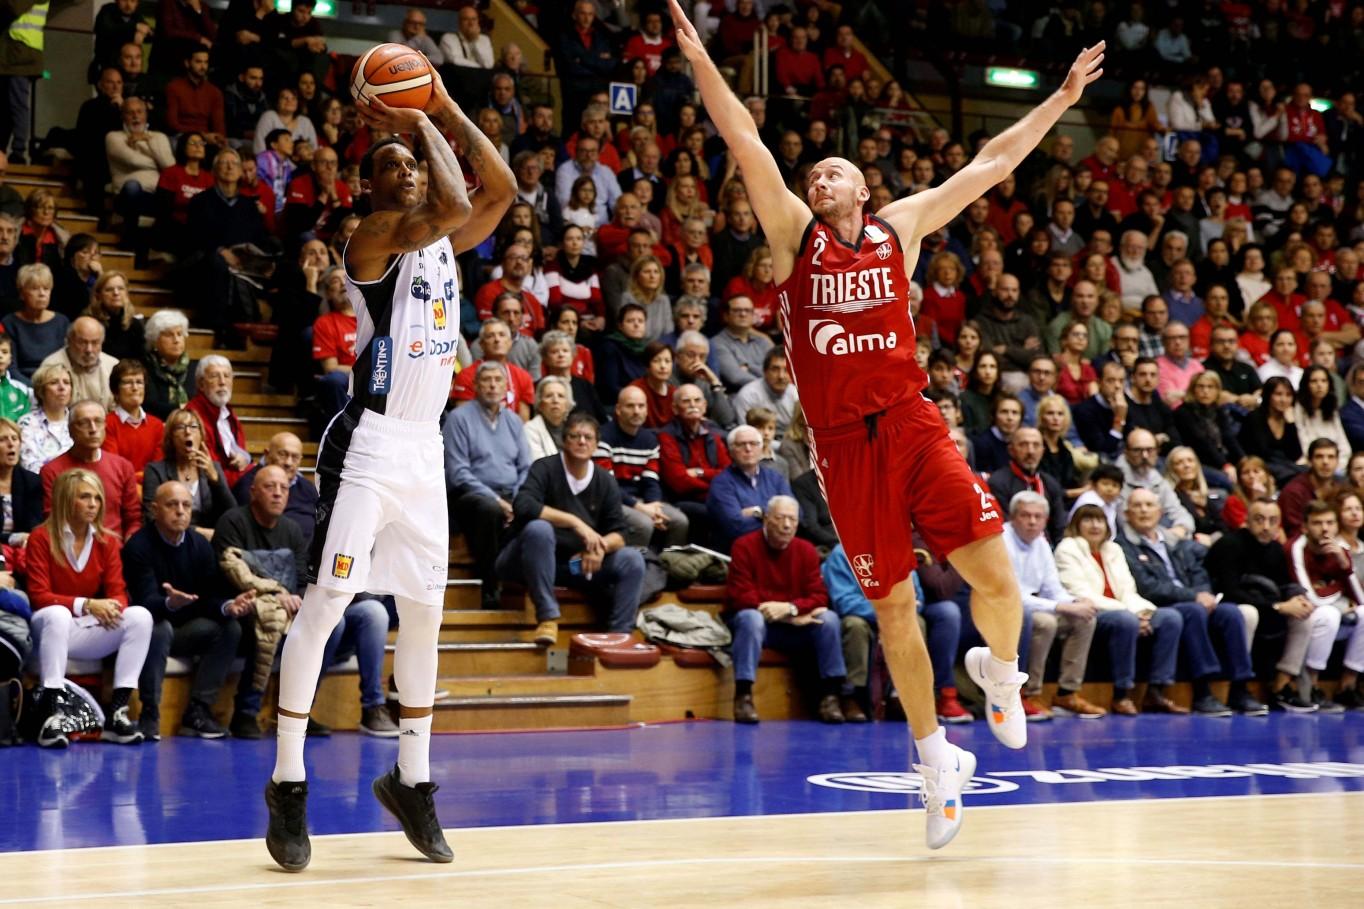 Gomes Joao Alma Trieste - Dolomiti Energia Trentino Lega Basket Serie A 2018/2019 Trieste, 17/11/2018 Foto A. Gilardi/Ag. Ciamillo Castoria